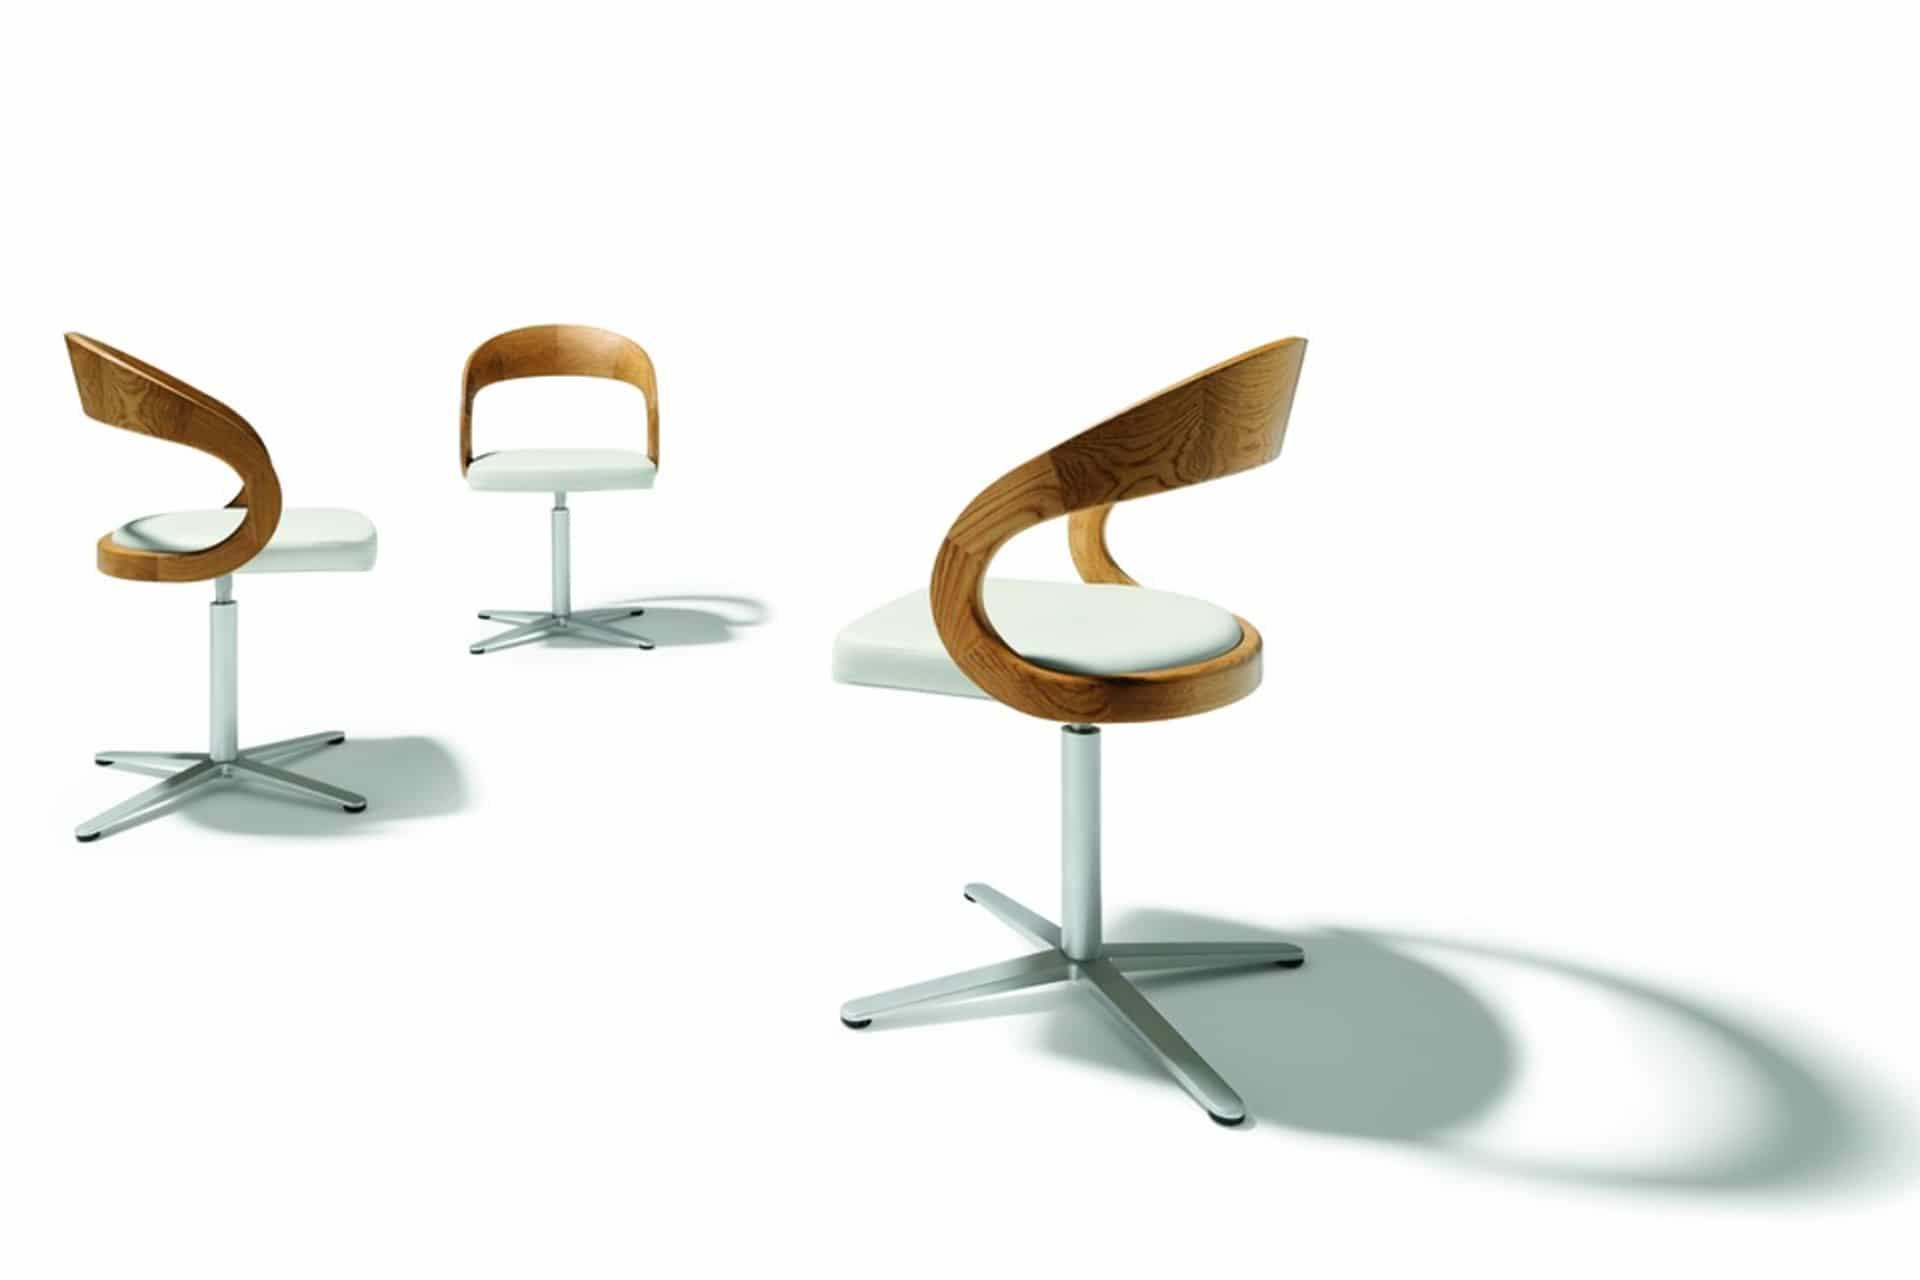 stuhl girado mit drehkreuz kohler nat rlich einrichten naturholzm bel team 7 naturm bel. Black Bedroom Furniture Sets. Home Design Ideas